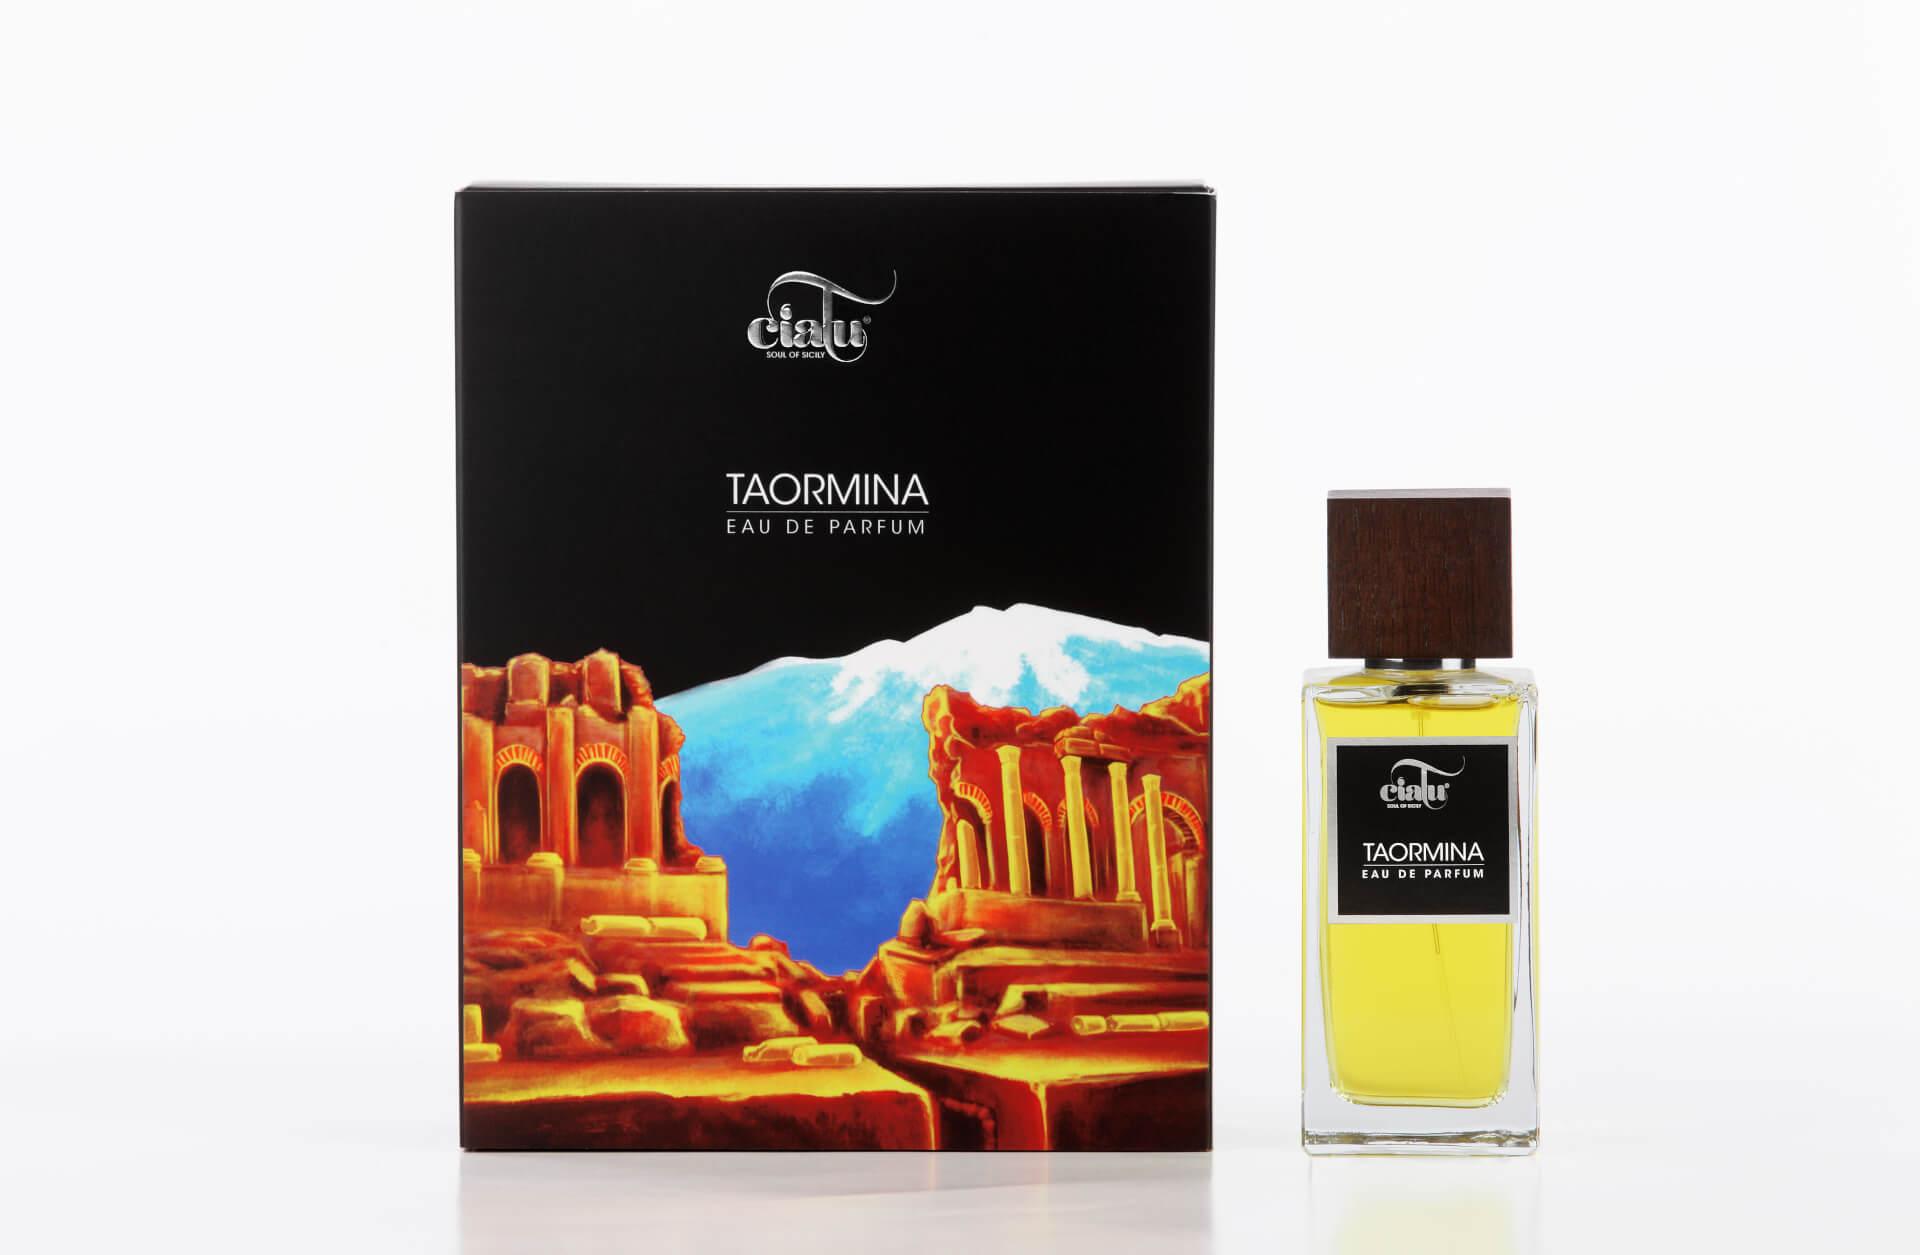 Ciatu | Eau de Parfum Taormina